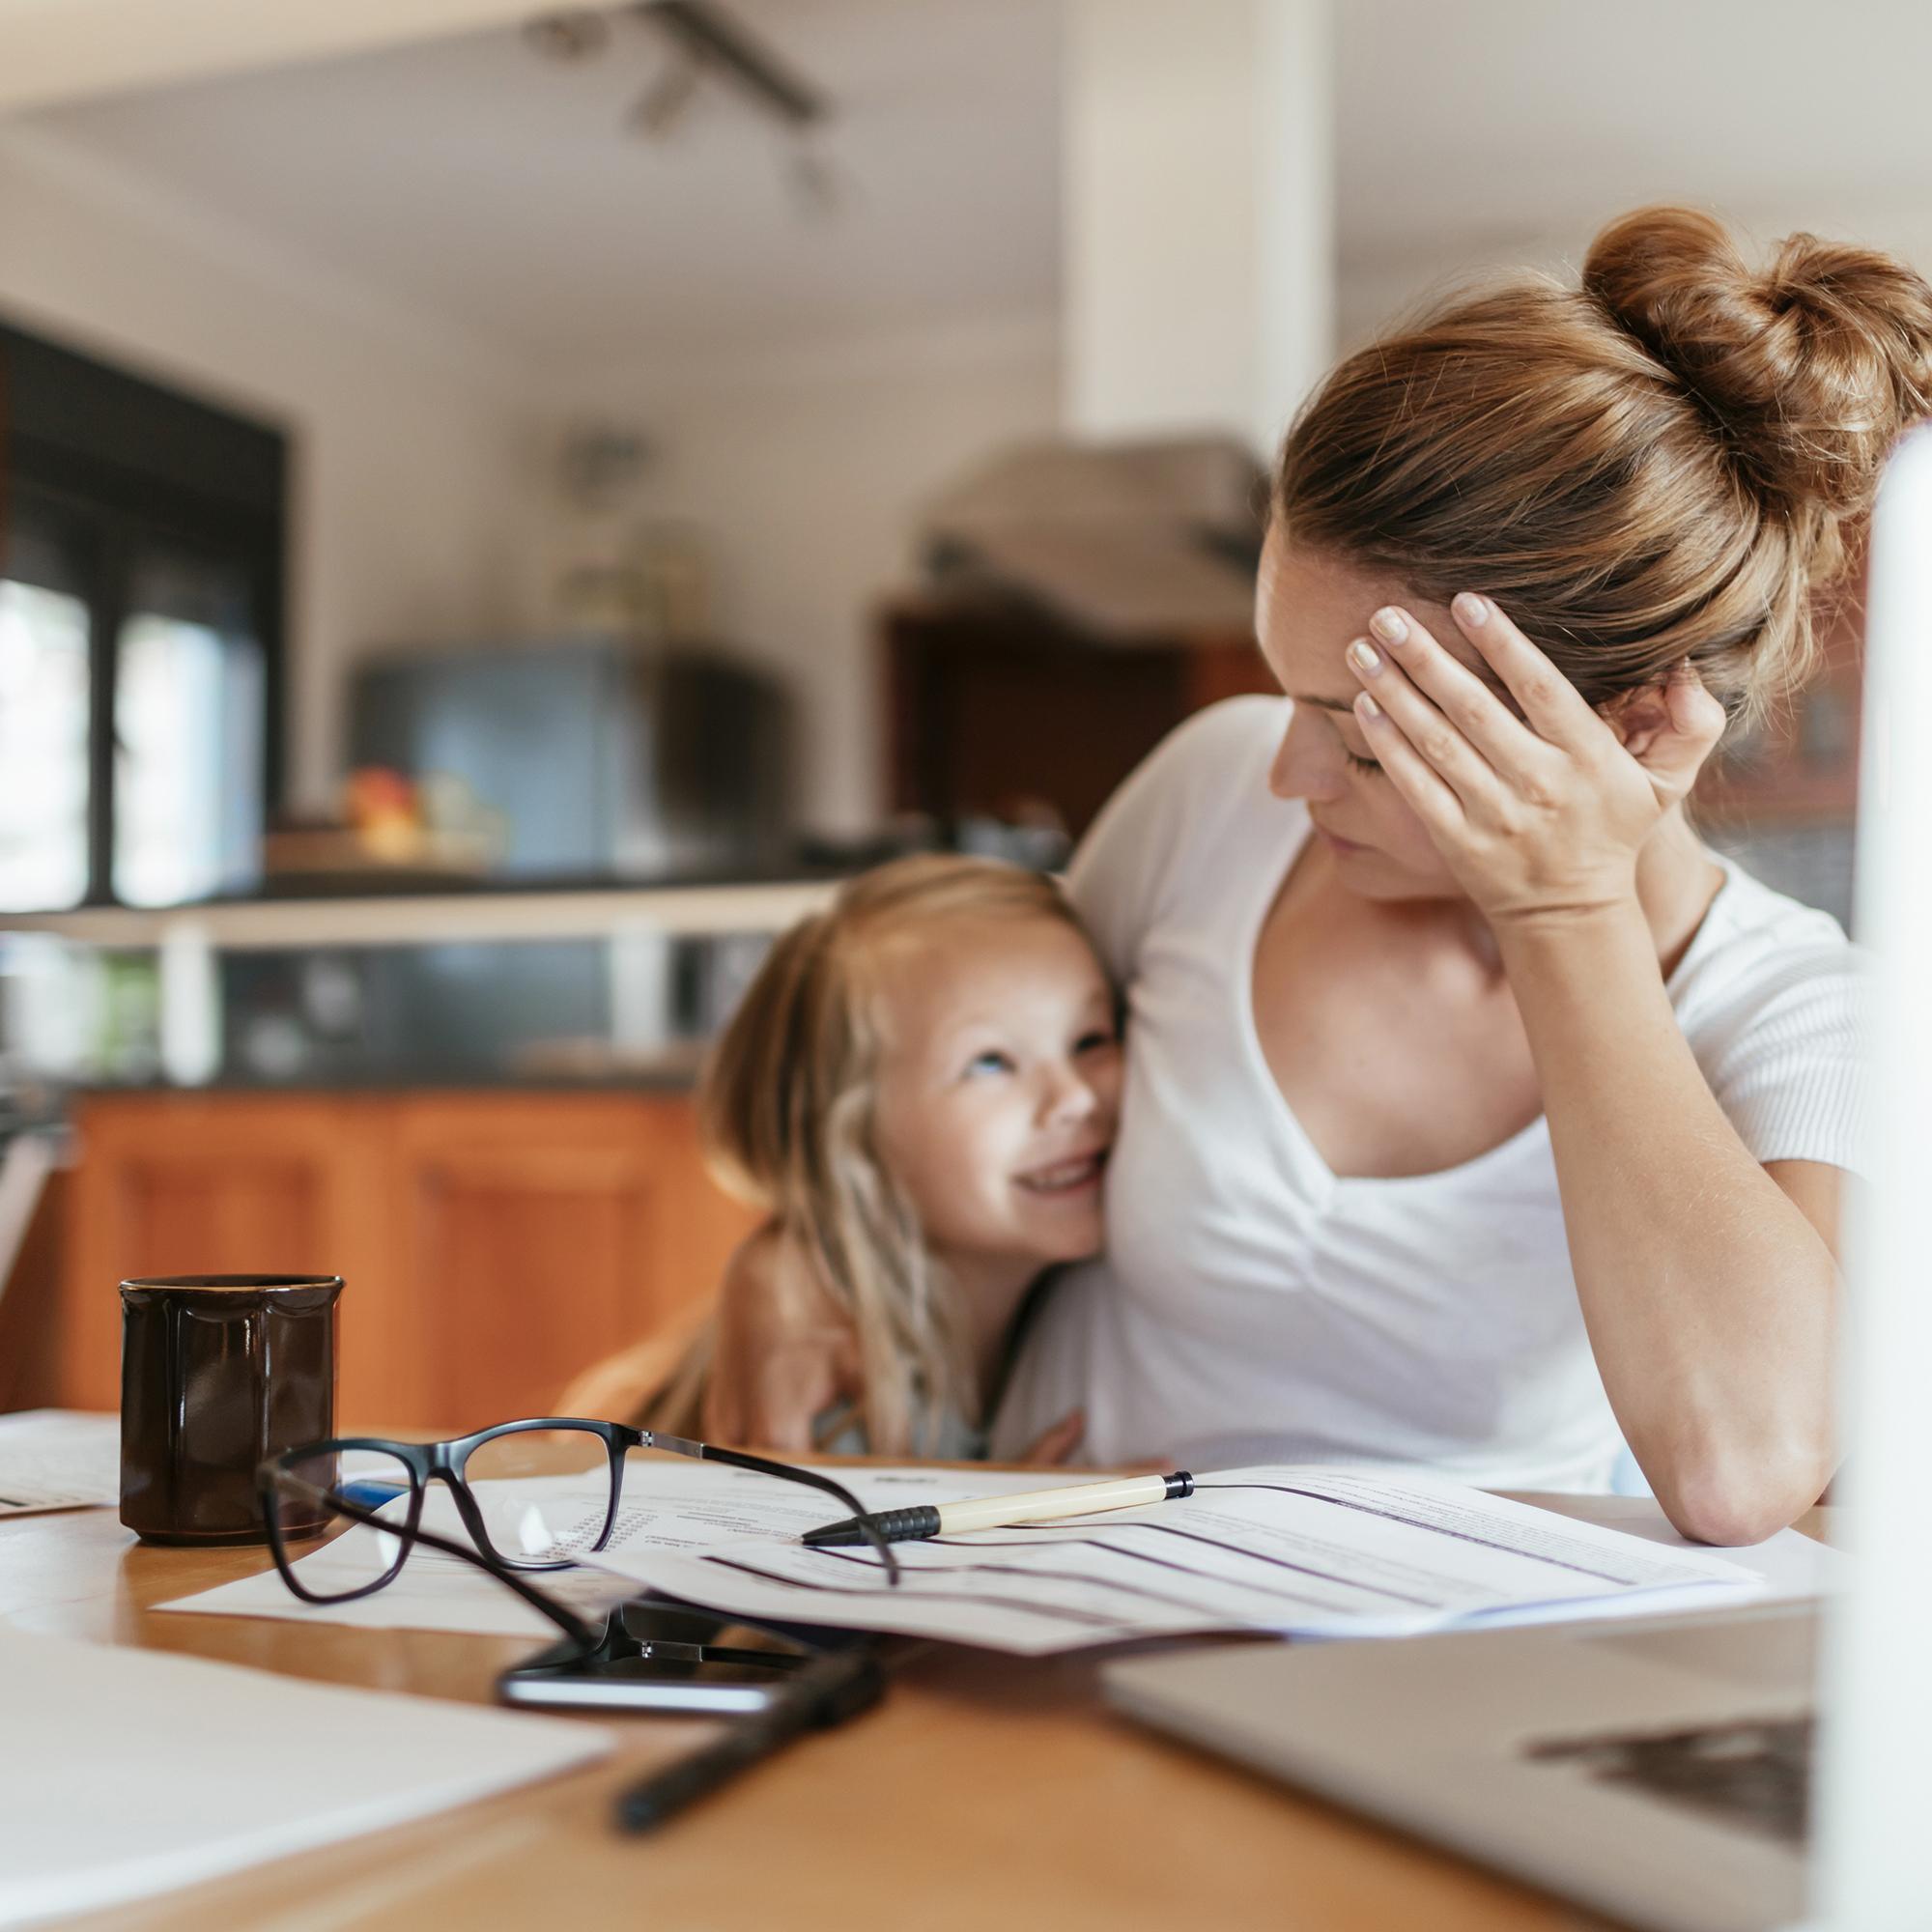 Working moms struggle most when kids start school